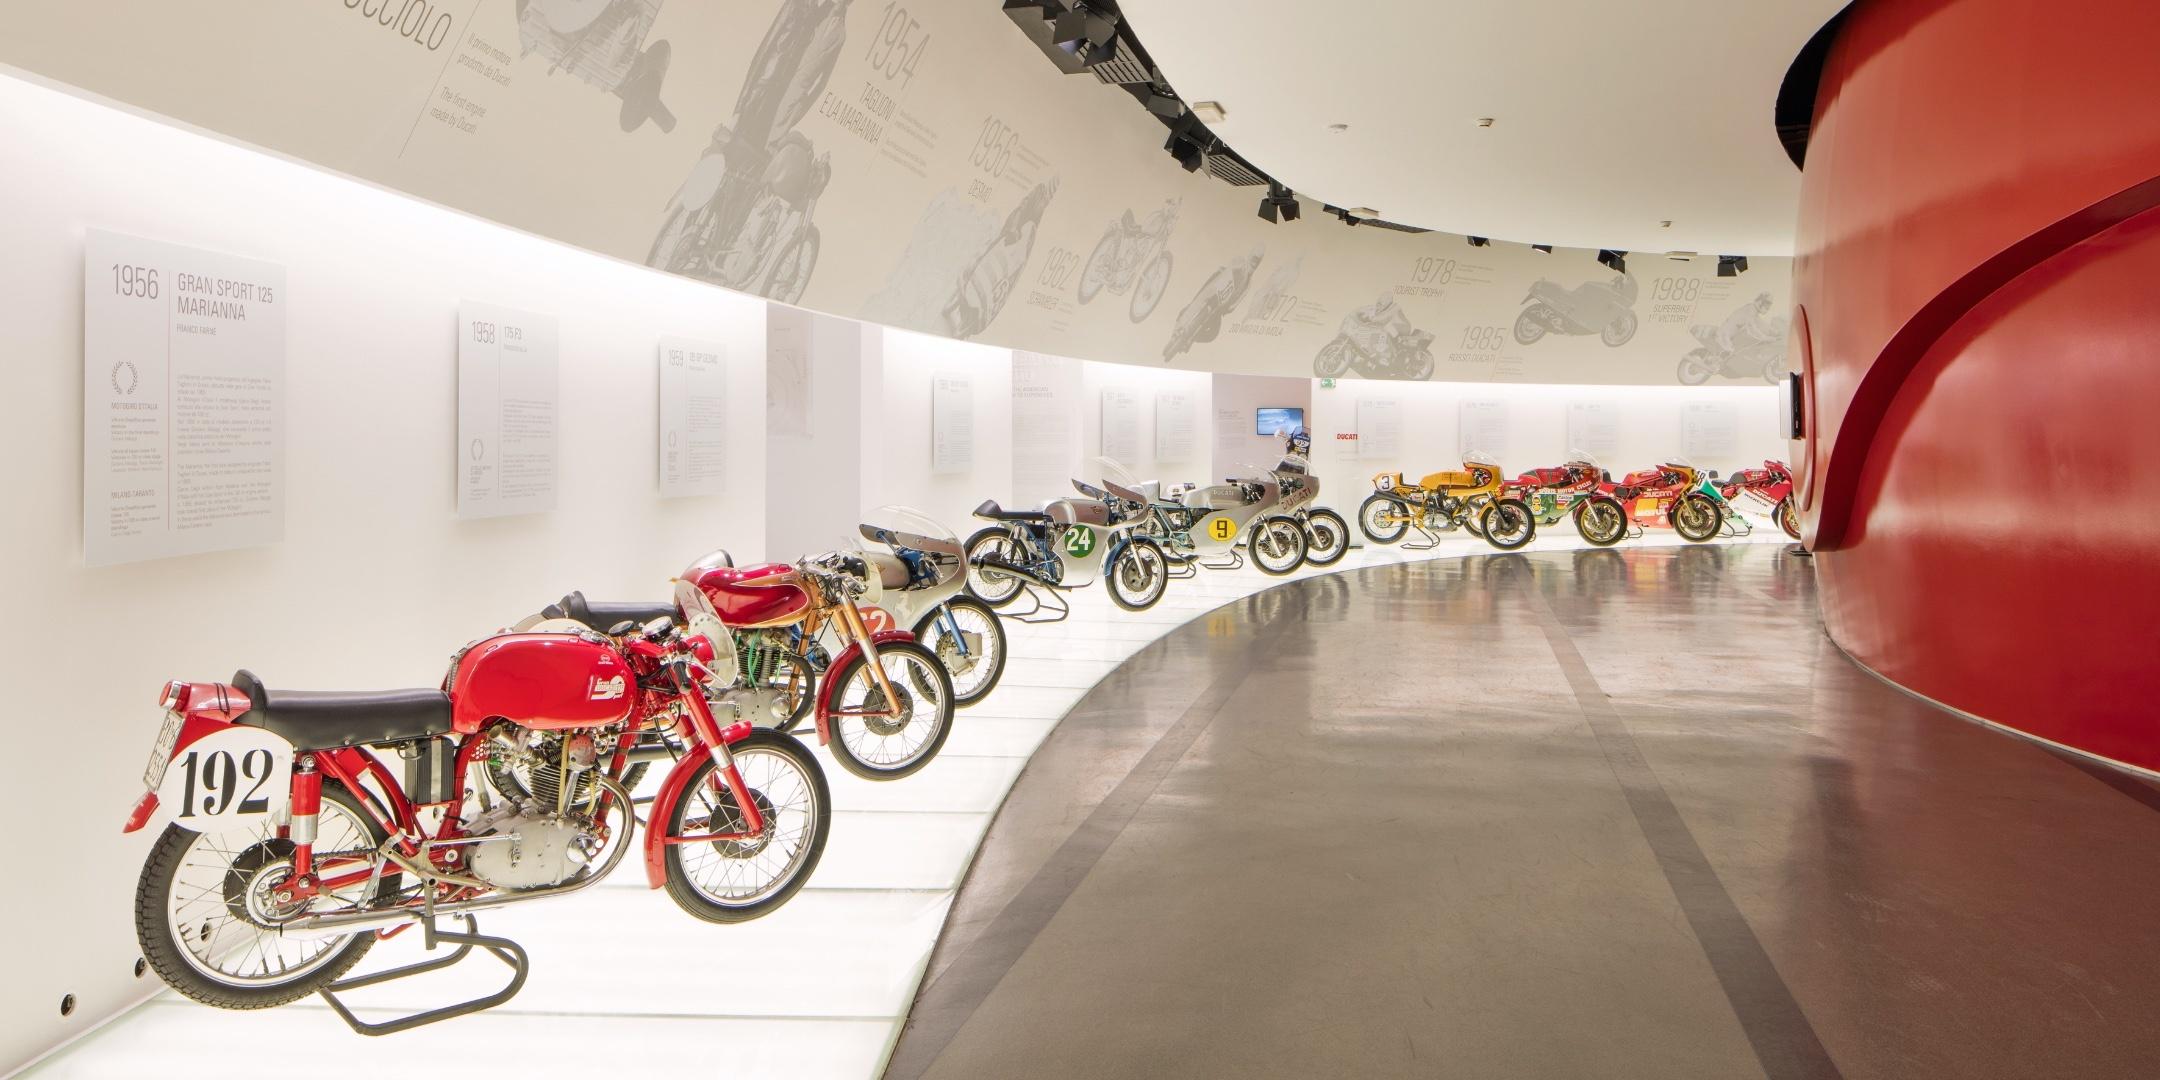 Visita guidata al Museo Ducati